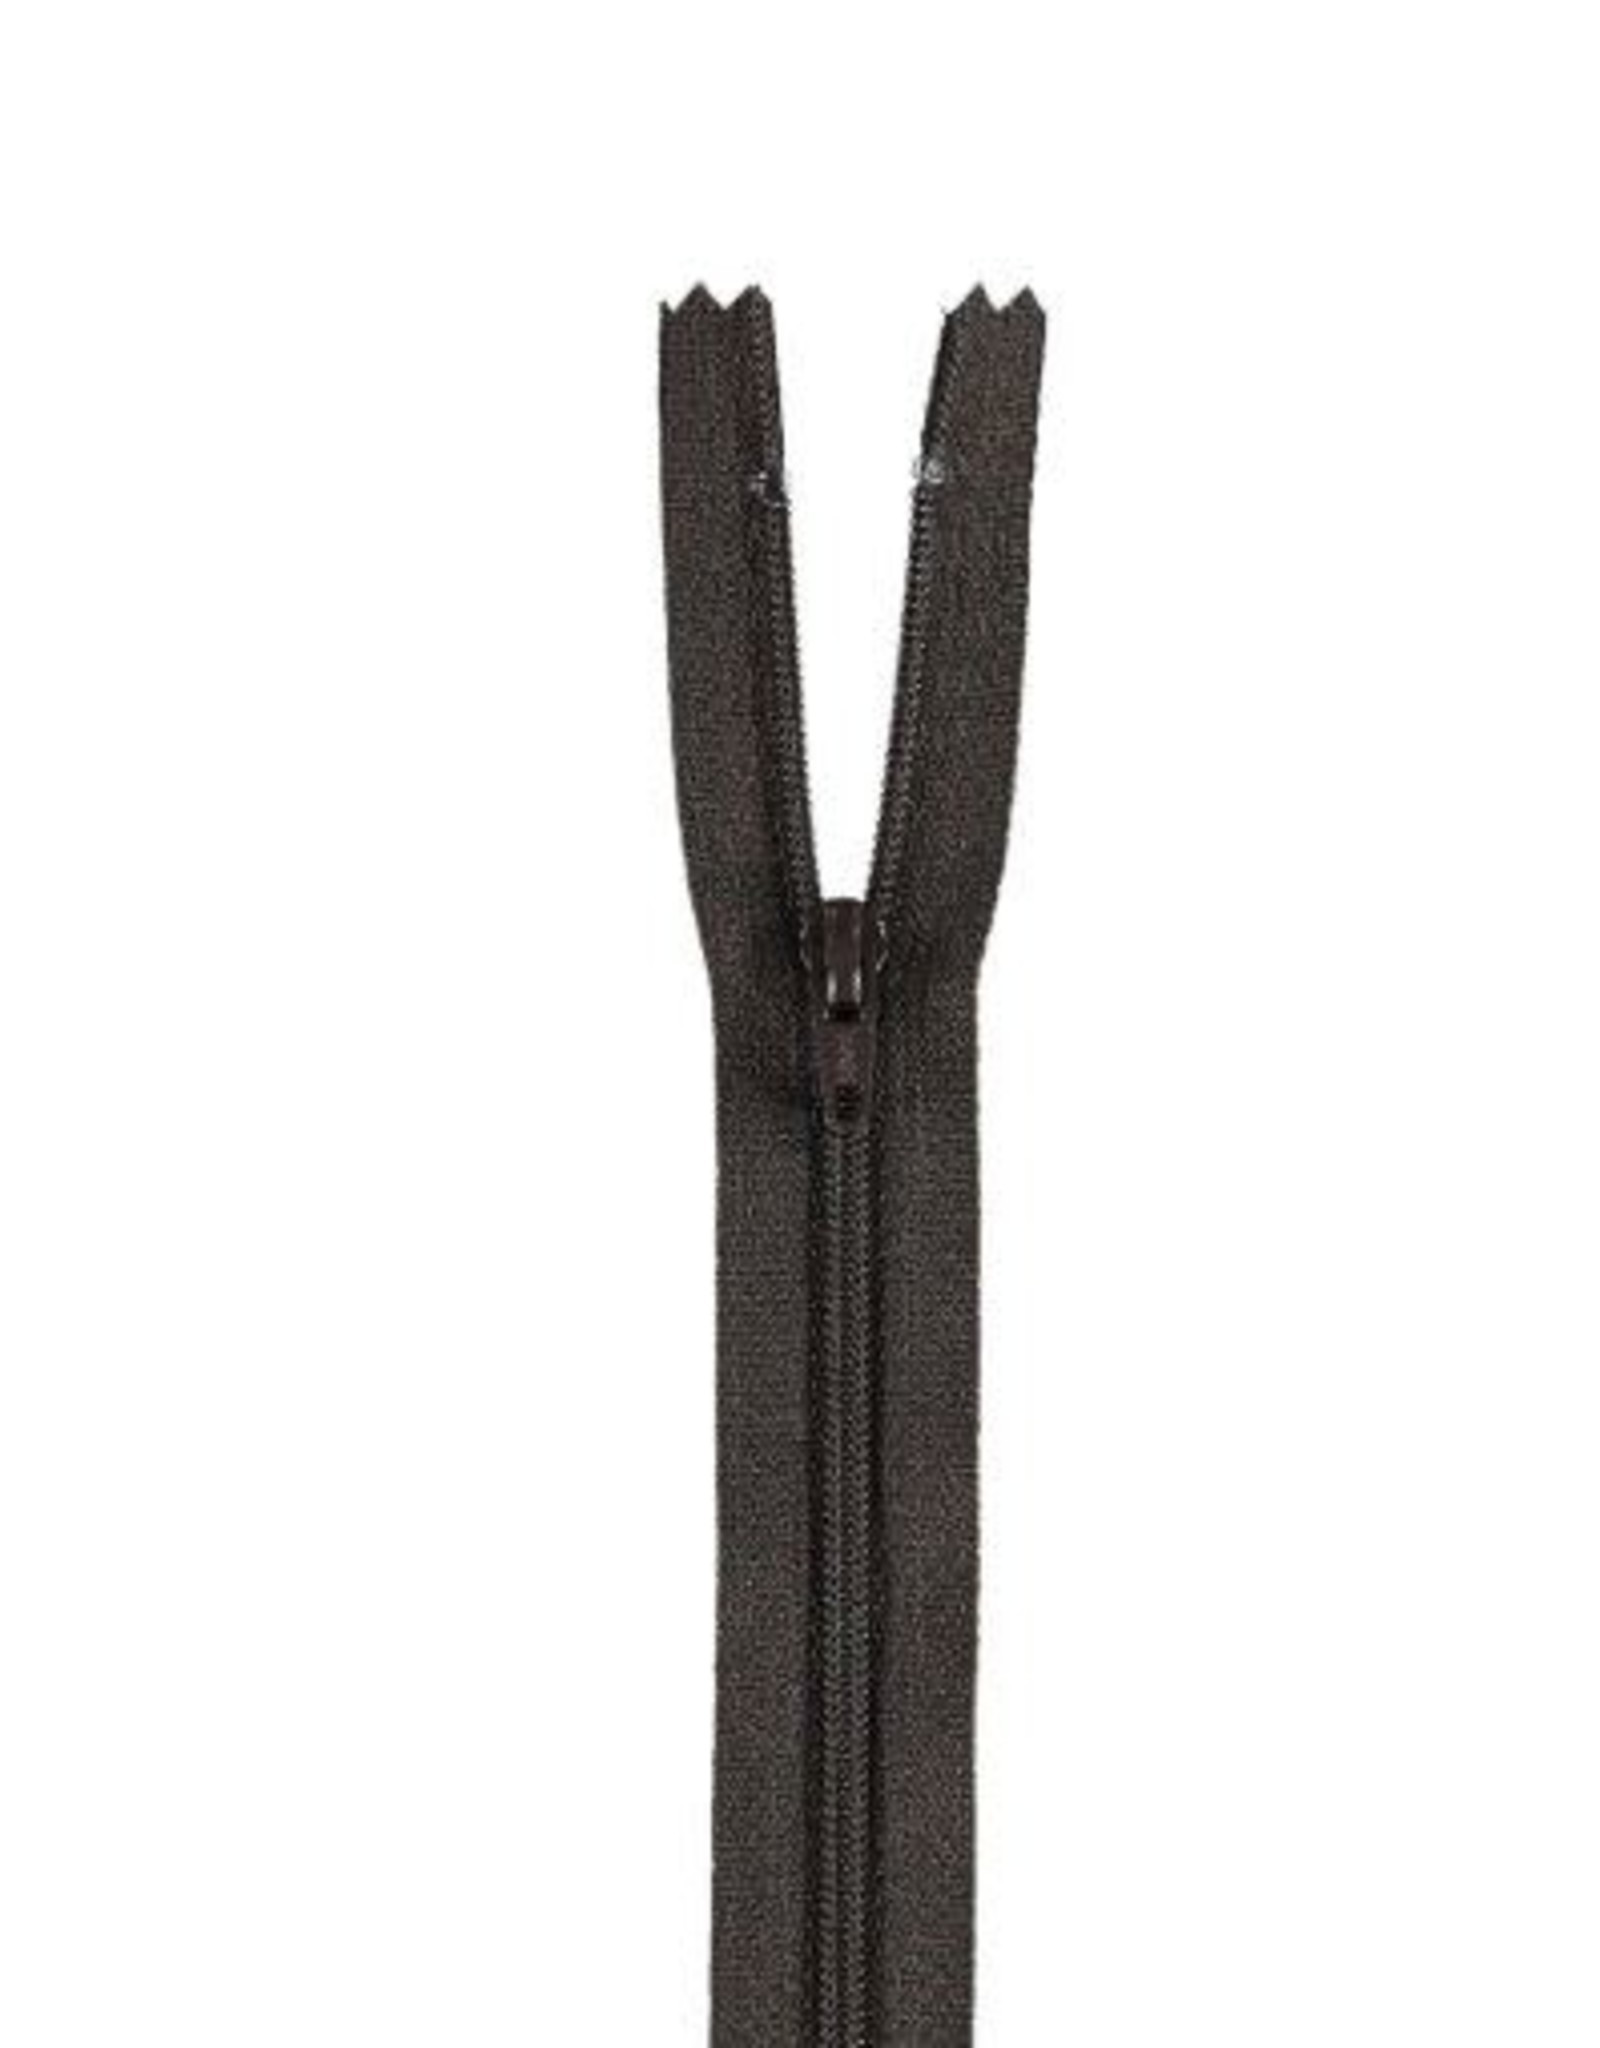 YKK Spiraalrits niet-DB 3mm zwart bruin 916-12cm